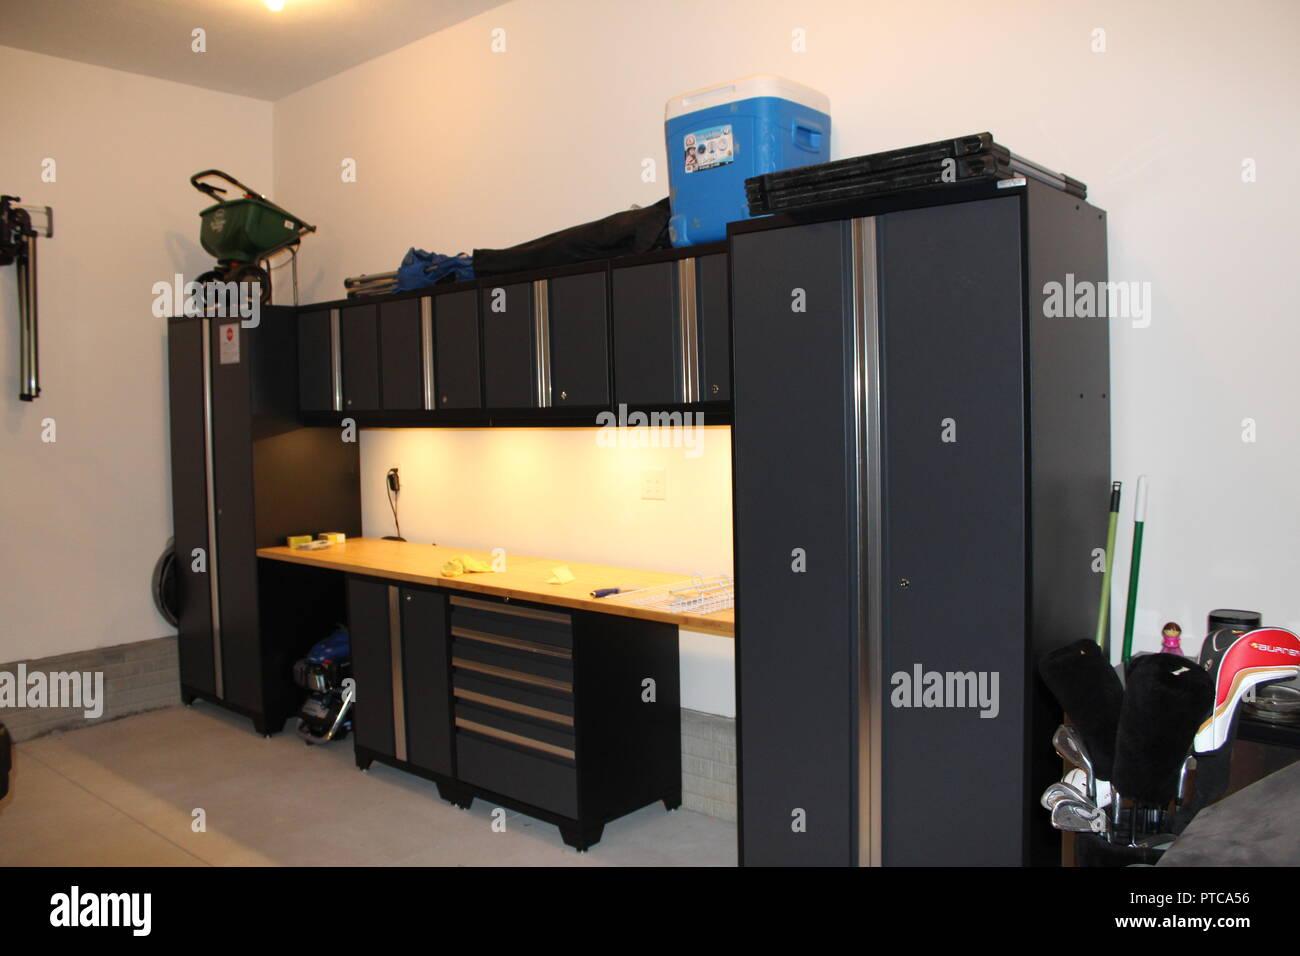 Swell Modern Black Workbench Installed In A New Garage Stock Photo Machost Co Dining Chair Design Ideas Machostcouk